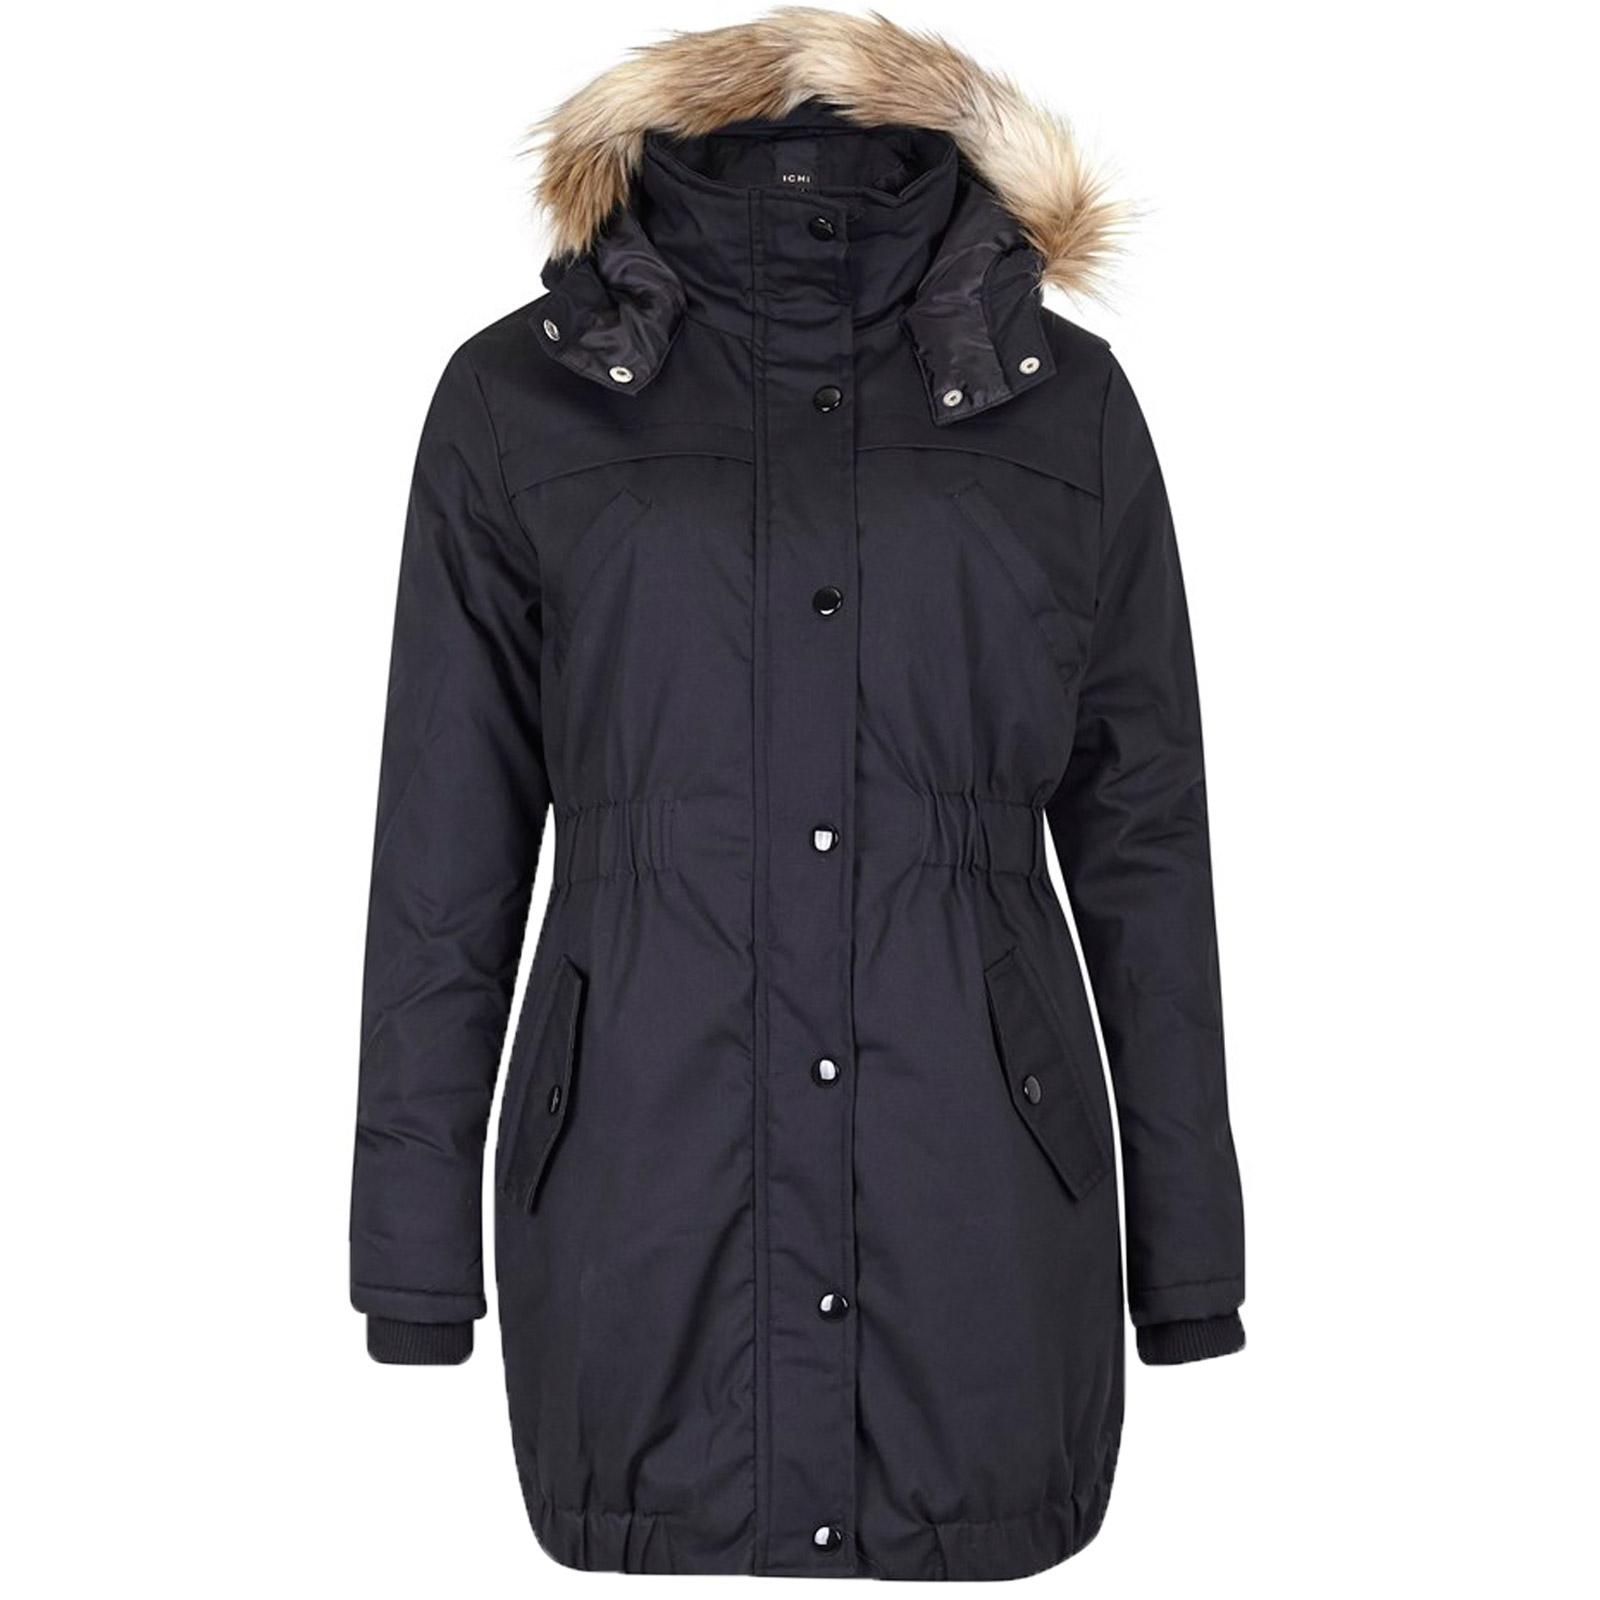 winterjacke parka jacke dunkelblau ichi damen fell jacke mantel warm kapuze step ebay. Black Bedroom Furniture Sets. Home Design Ideas